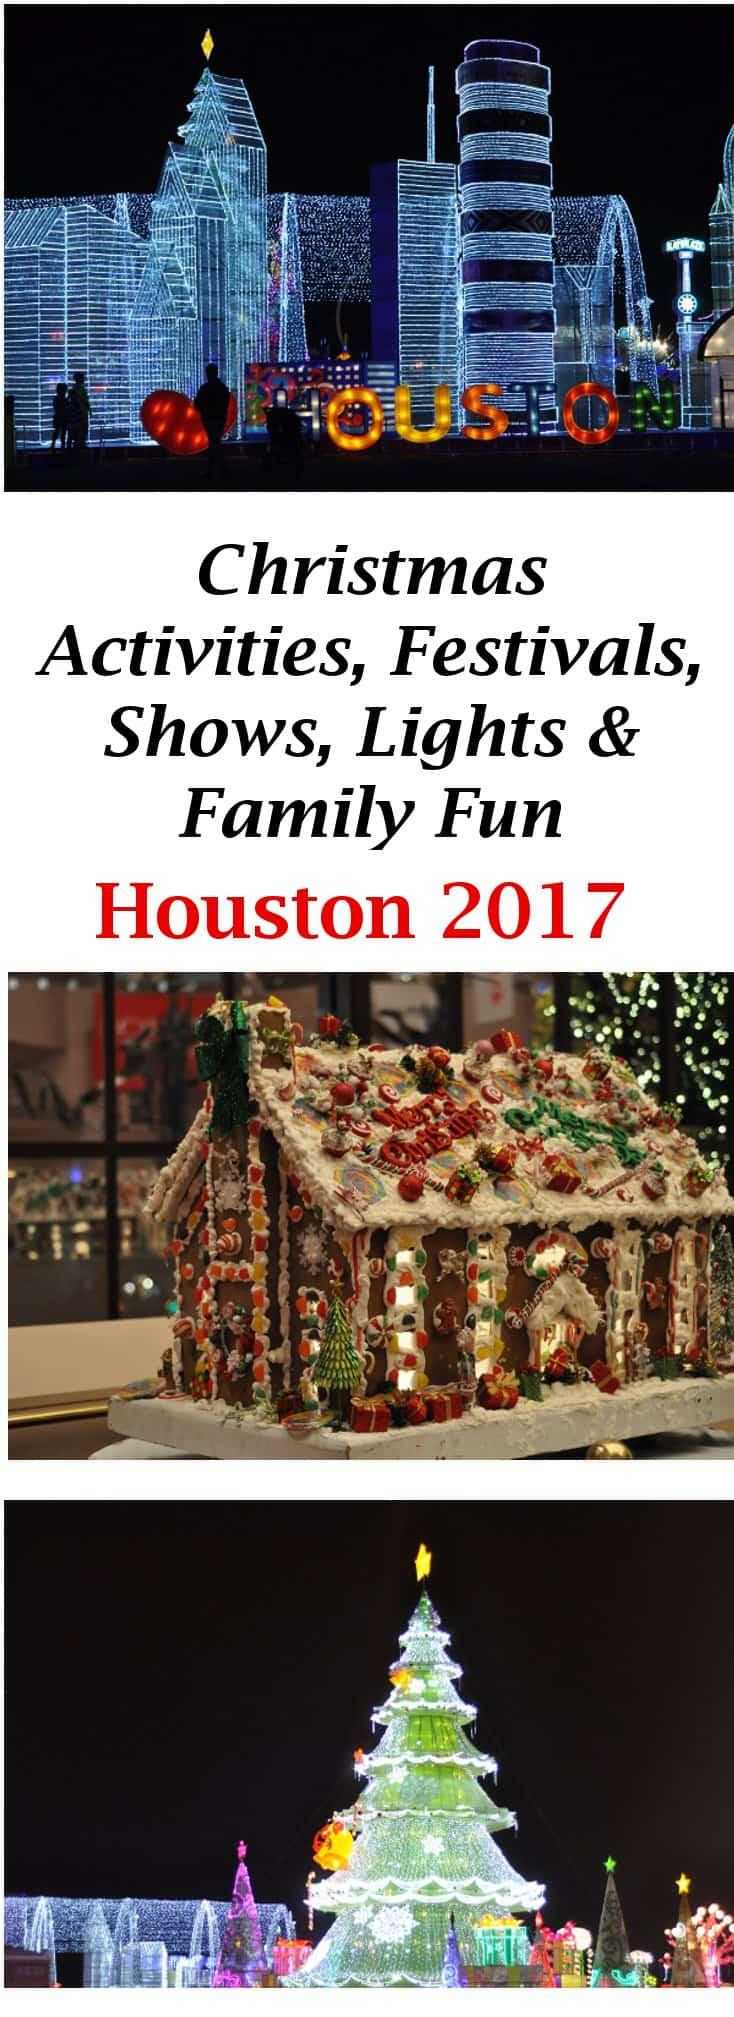 Christmas 2013 Activities Houston